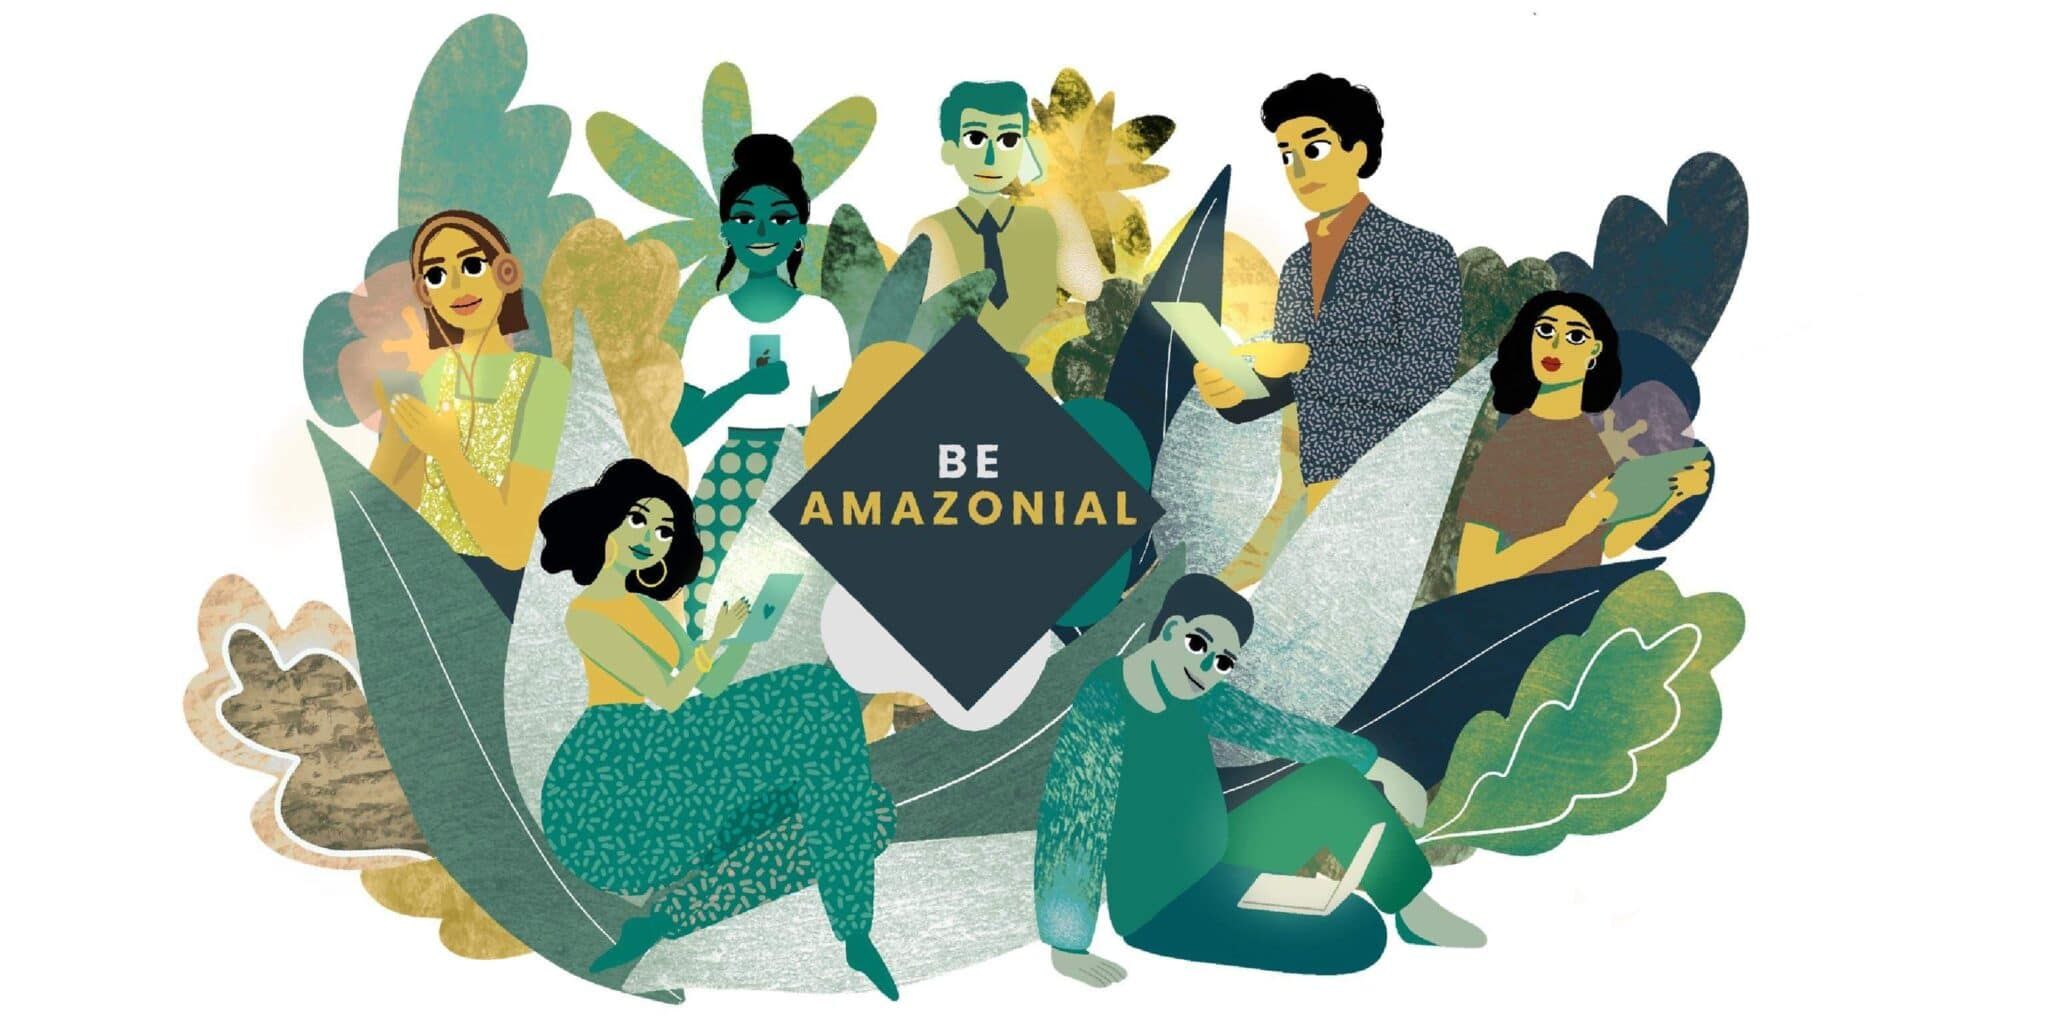 BE-AMAZONIAL